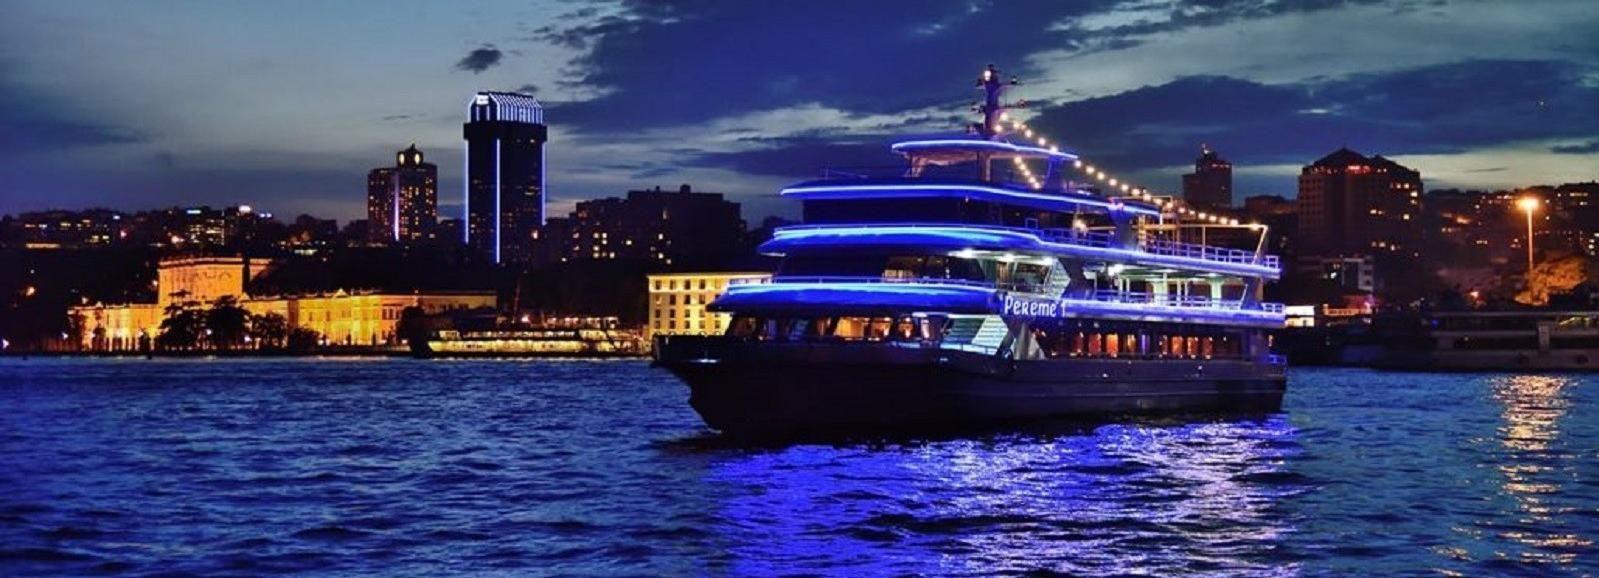 Istanbul: Bosphorus Dinner Cruise with Dance Show